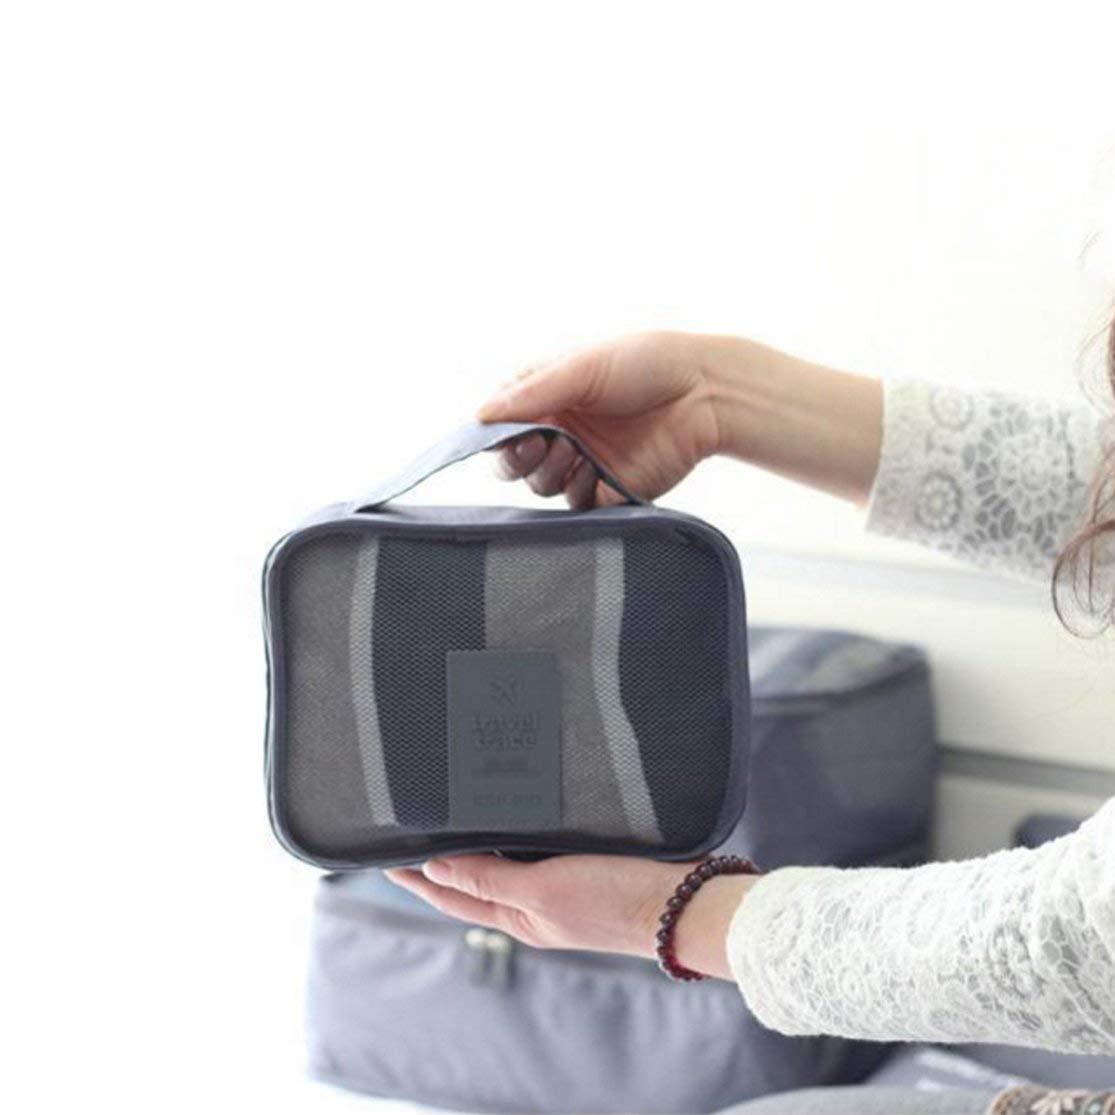 6PCS Set Bolsa de Almacenamiento de Viaje Equipaje Maleta Bolsa para Sujetador Cosm/éticos Ropa Interior Ropa Divisor Contenedor Organizador ordenado Color: Gris